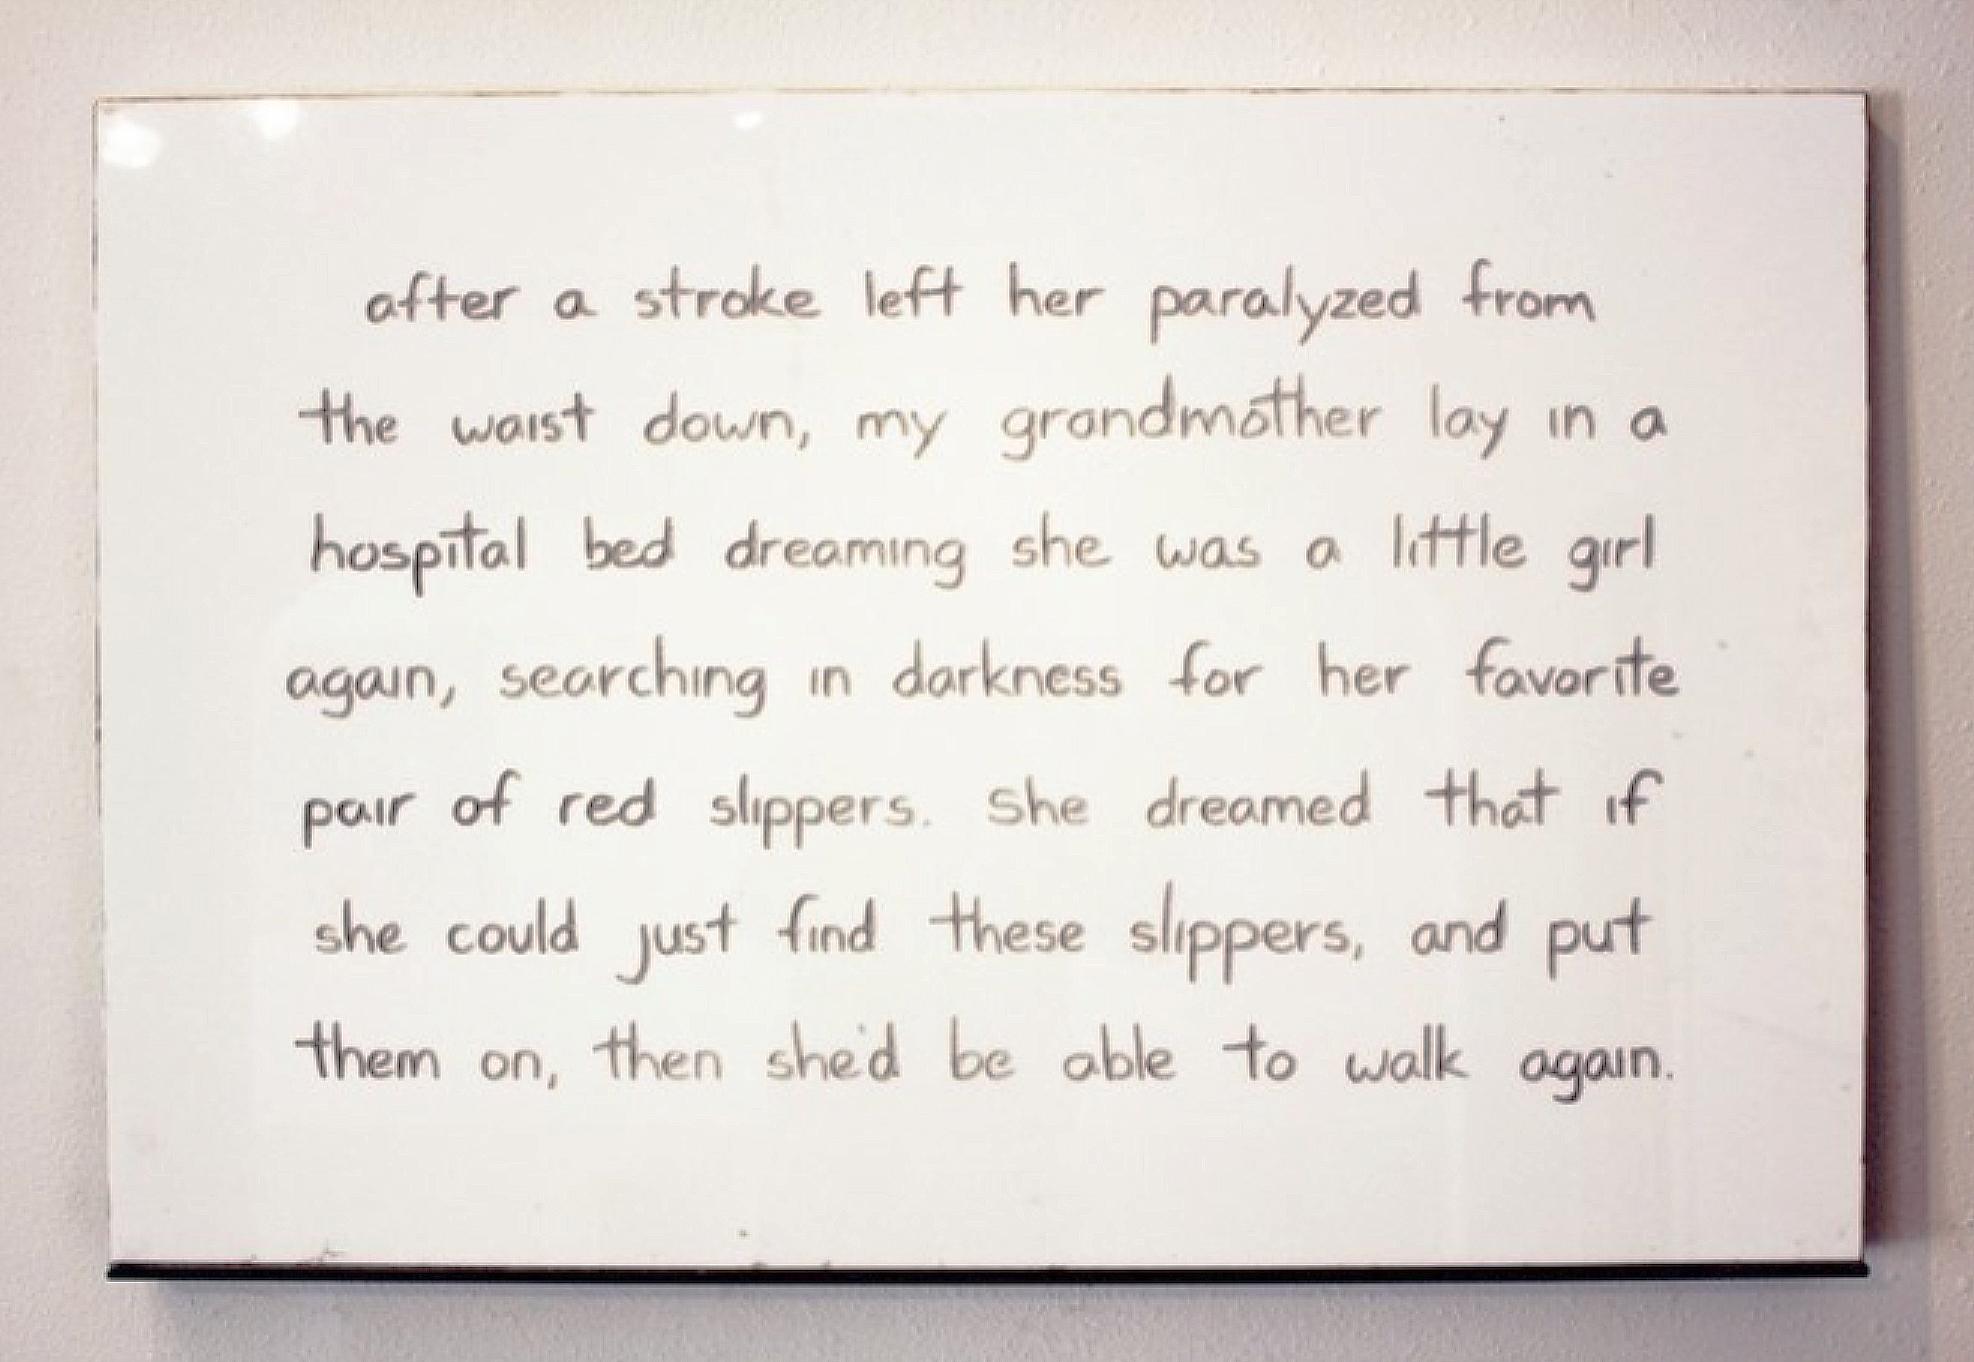 grandma was a girl plaque.jpg